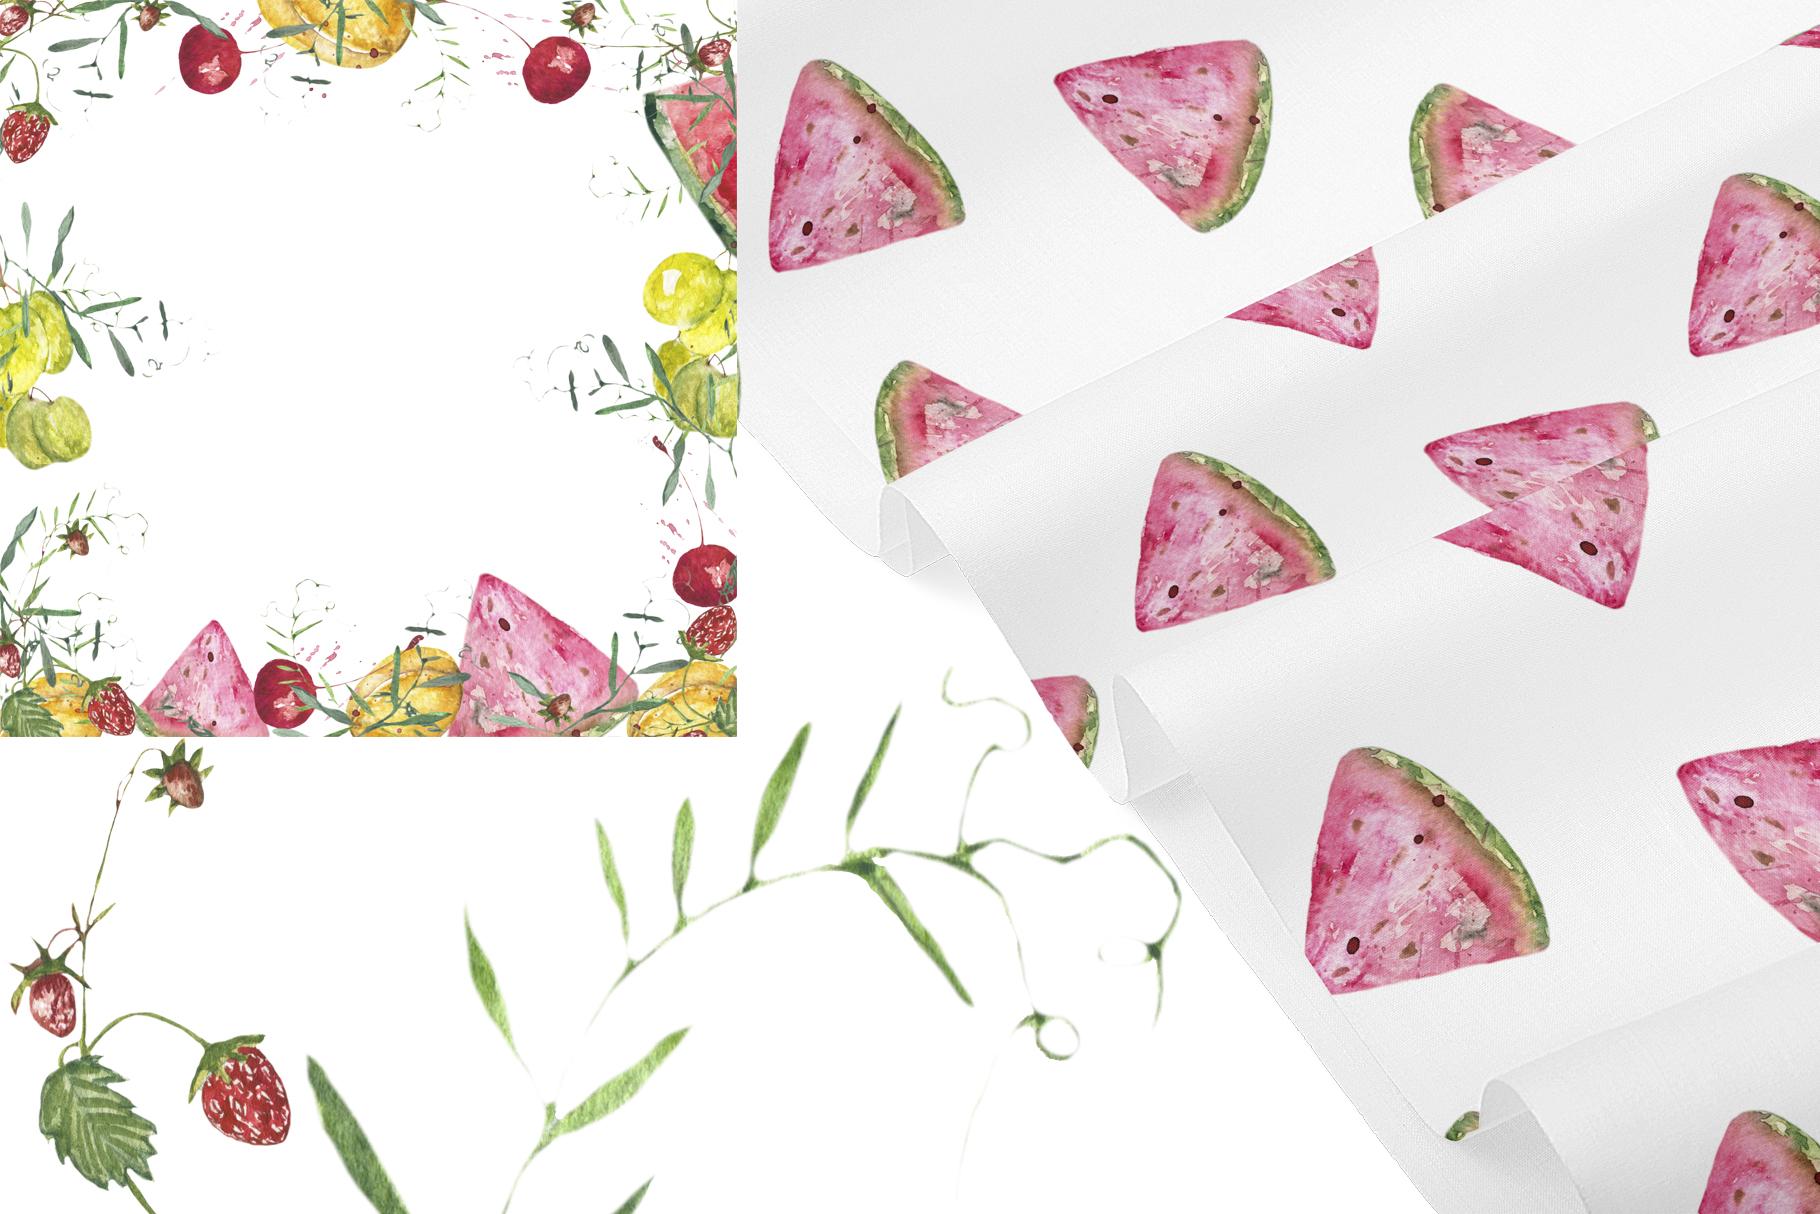 Fruit vegetables food watercolor example image 8